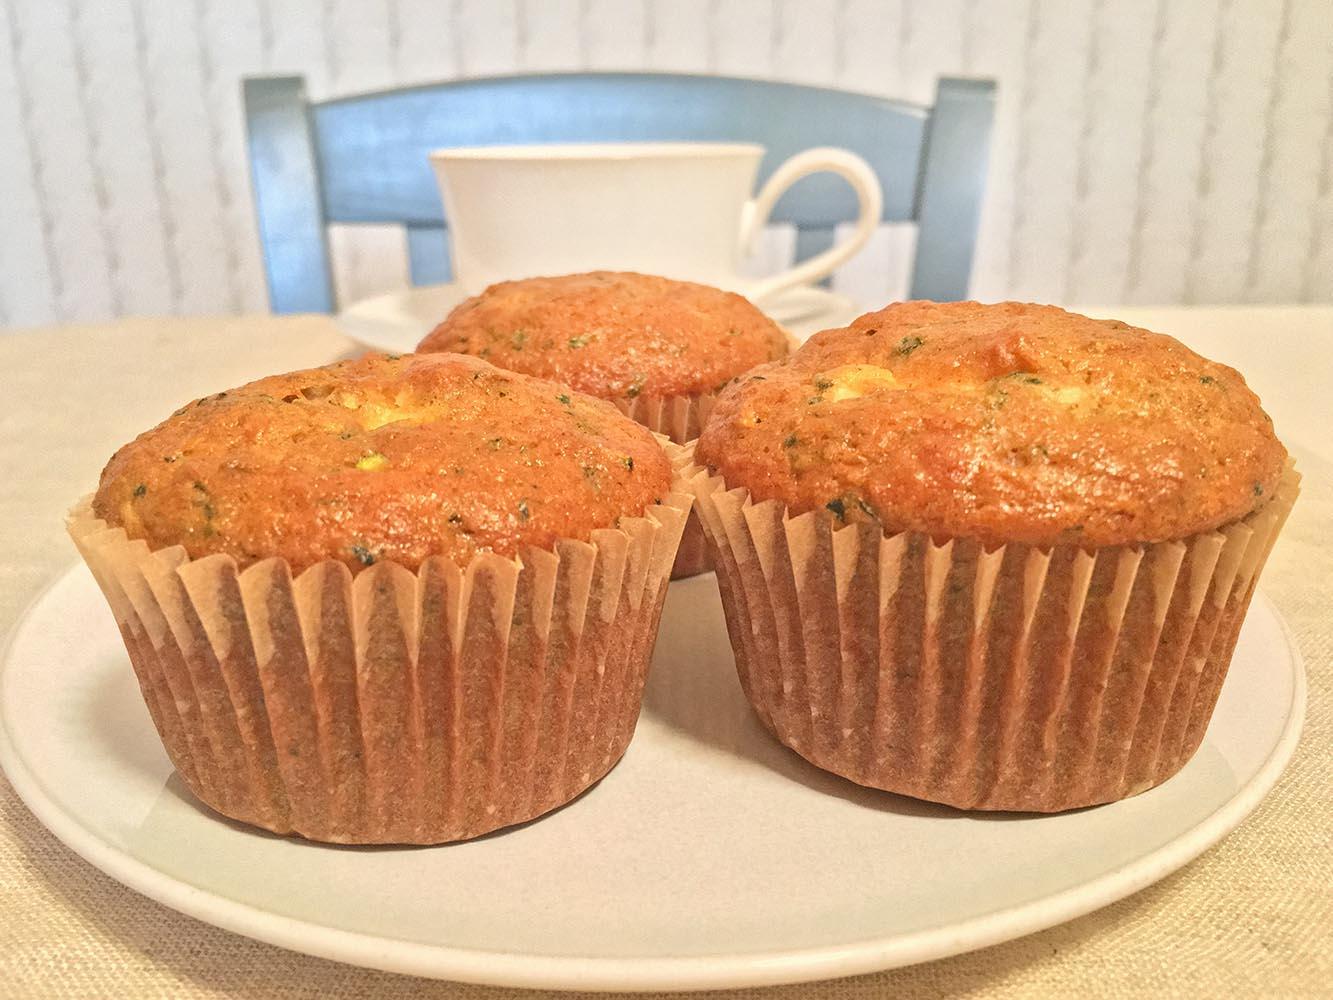 Zucchini Cream Cheese Muffins with Coffee